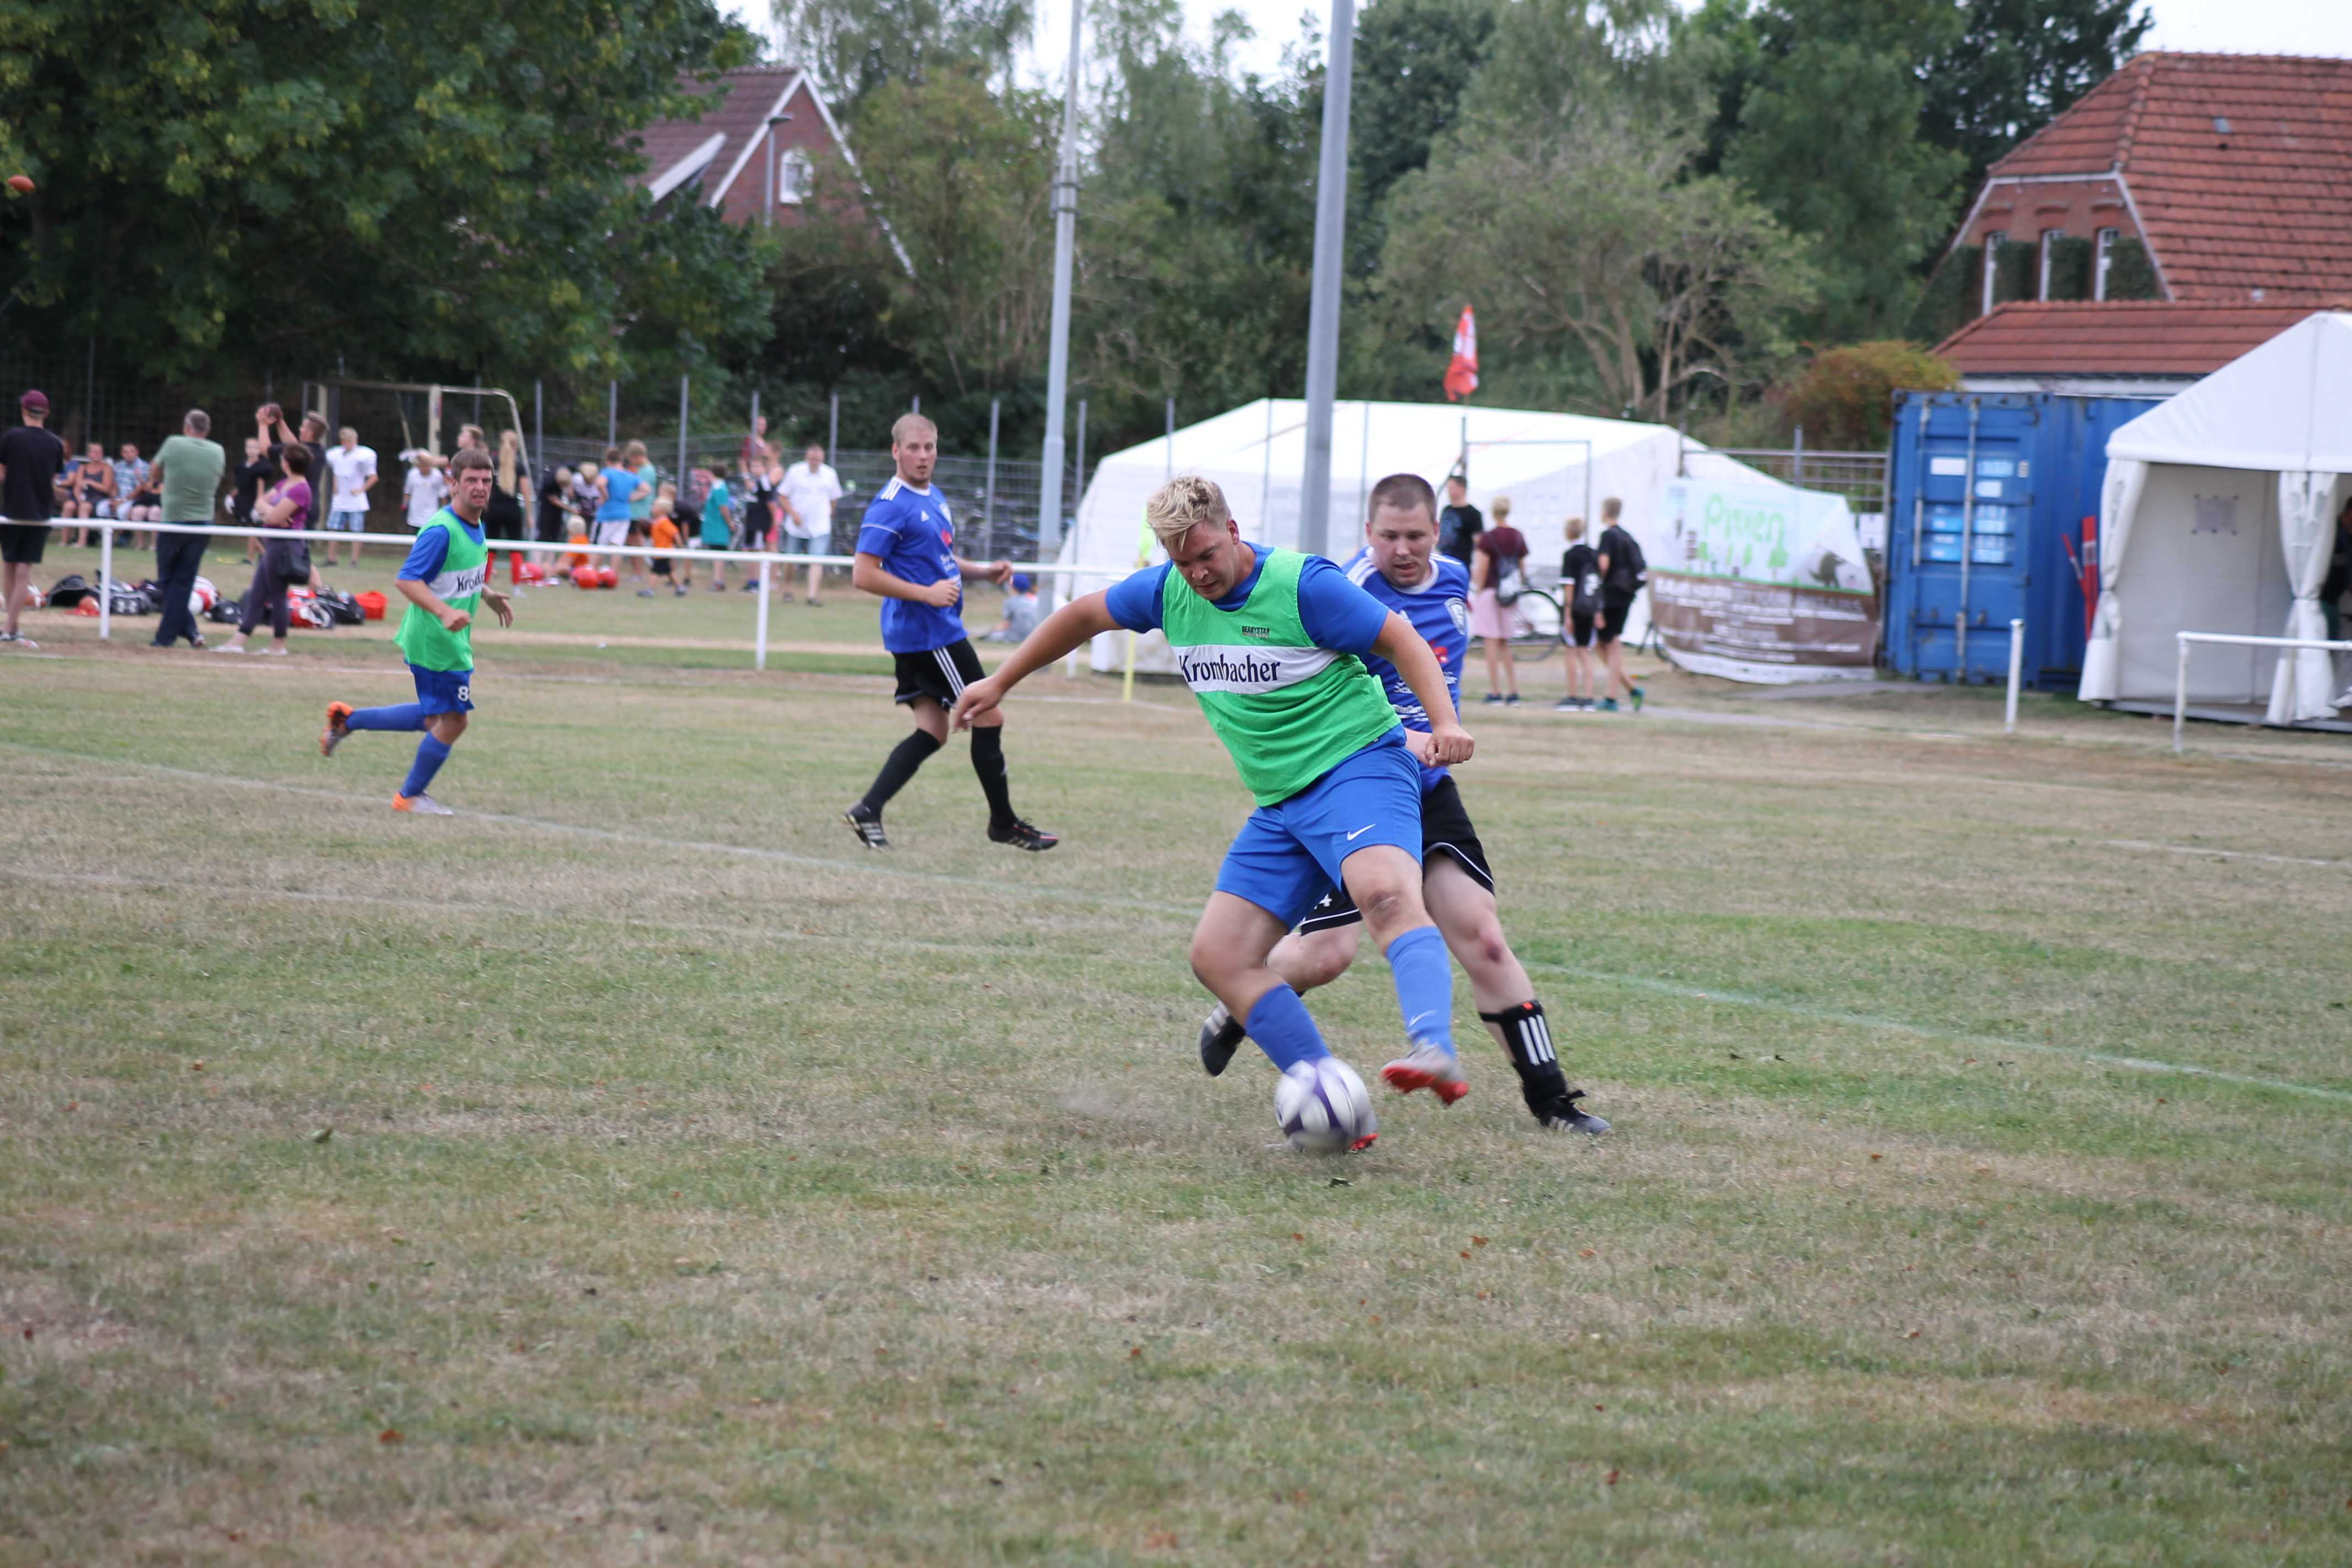 2018-07-29 Sportwoche - Sportpicknick & Football & Fußball (105)